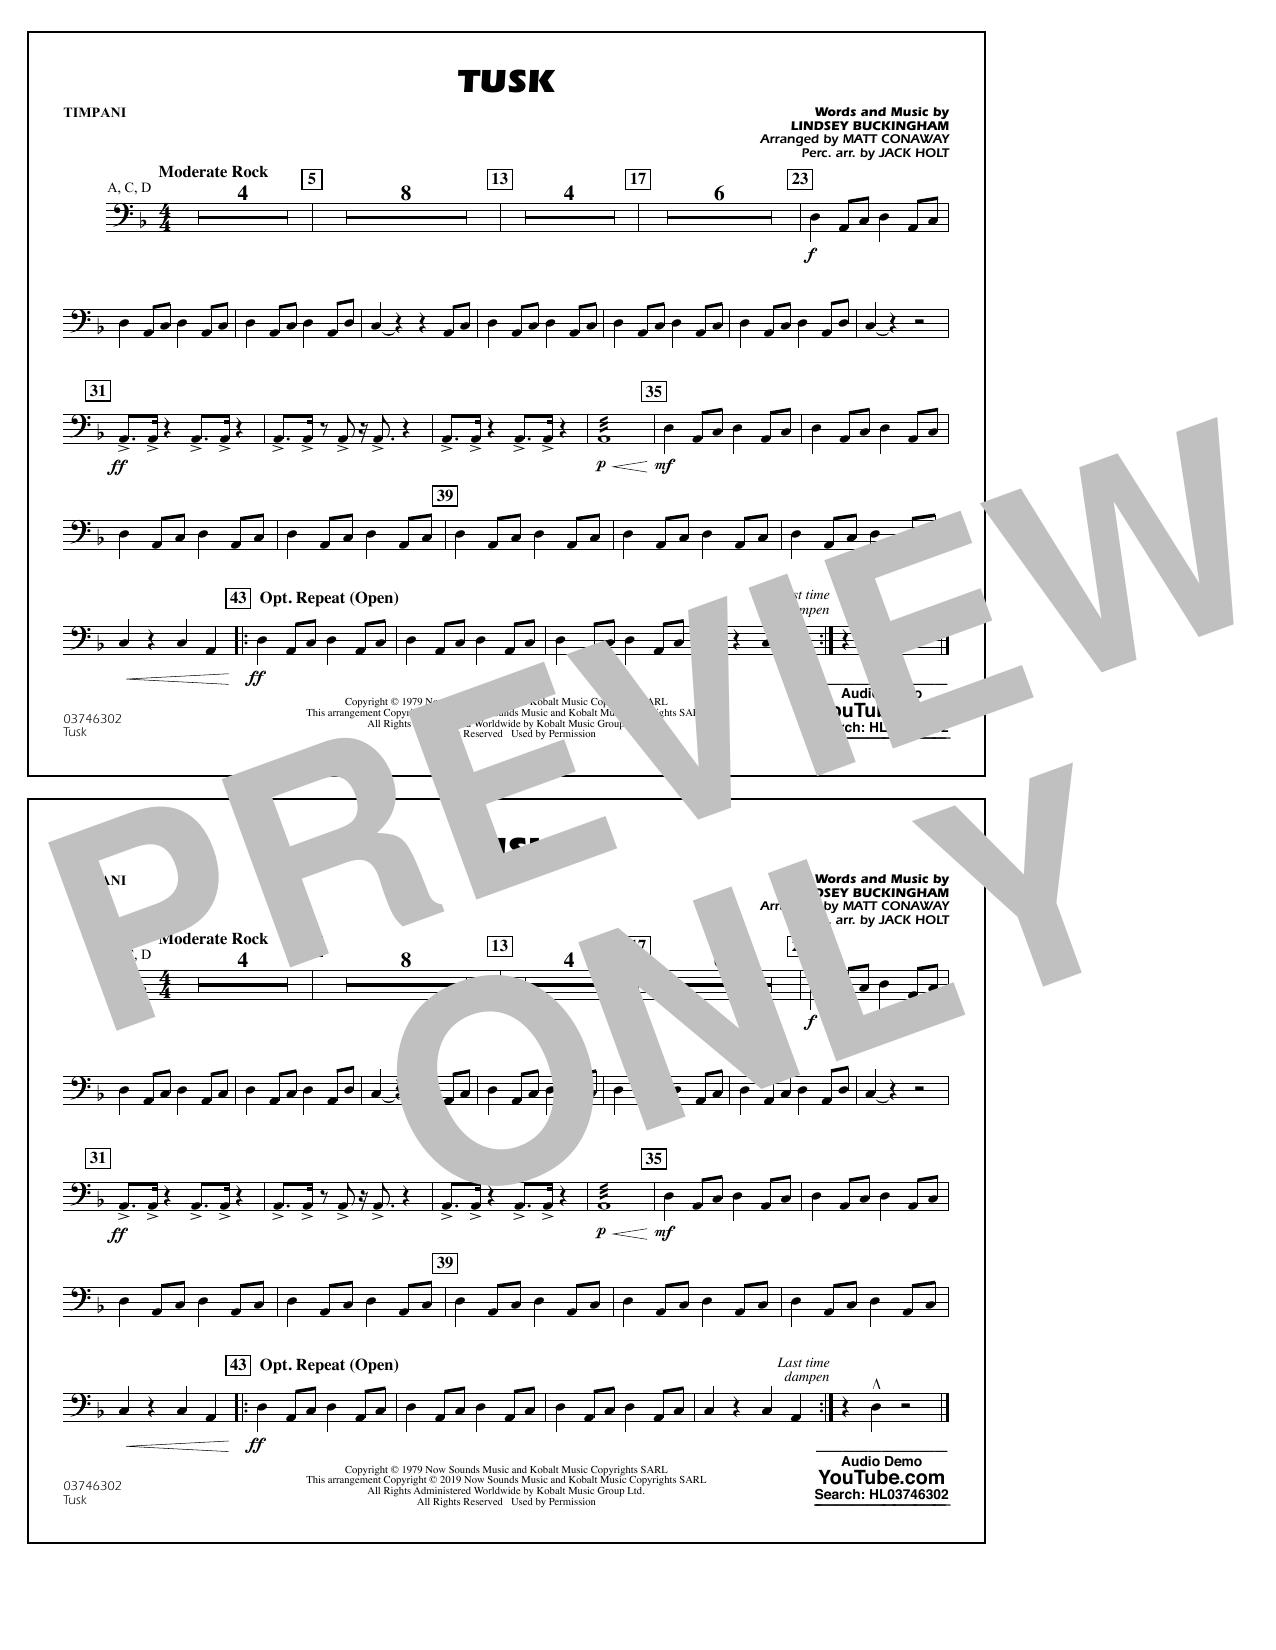 Fleetwood Mac Tusk (arr. Matt Conaway) - Timpani sheet music notes and chords